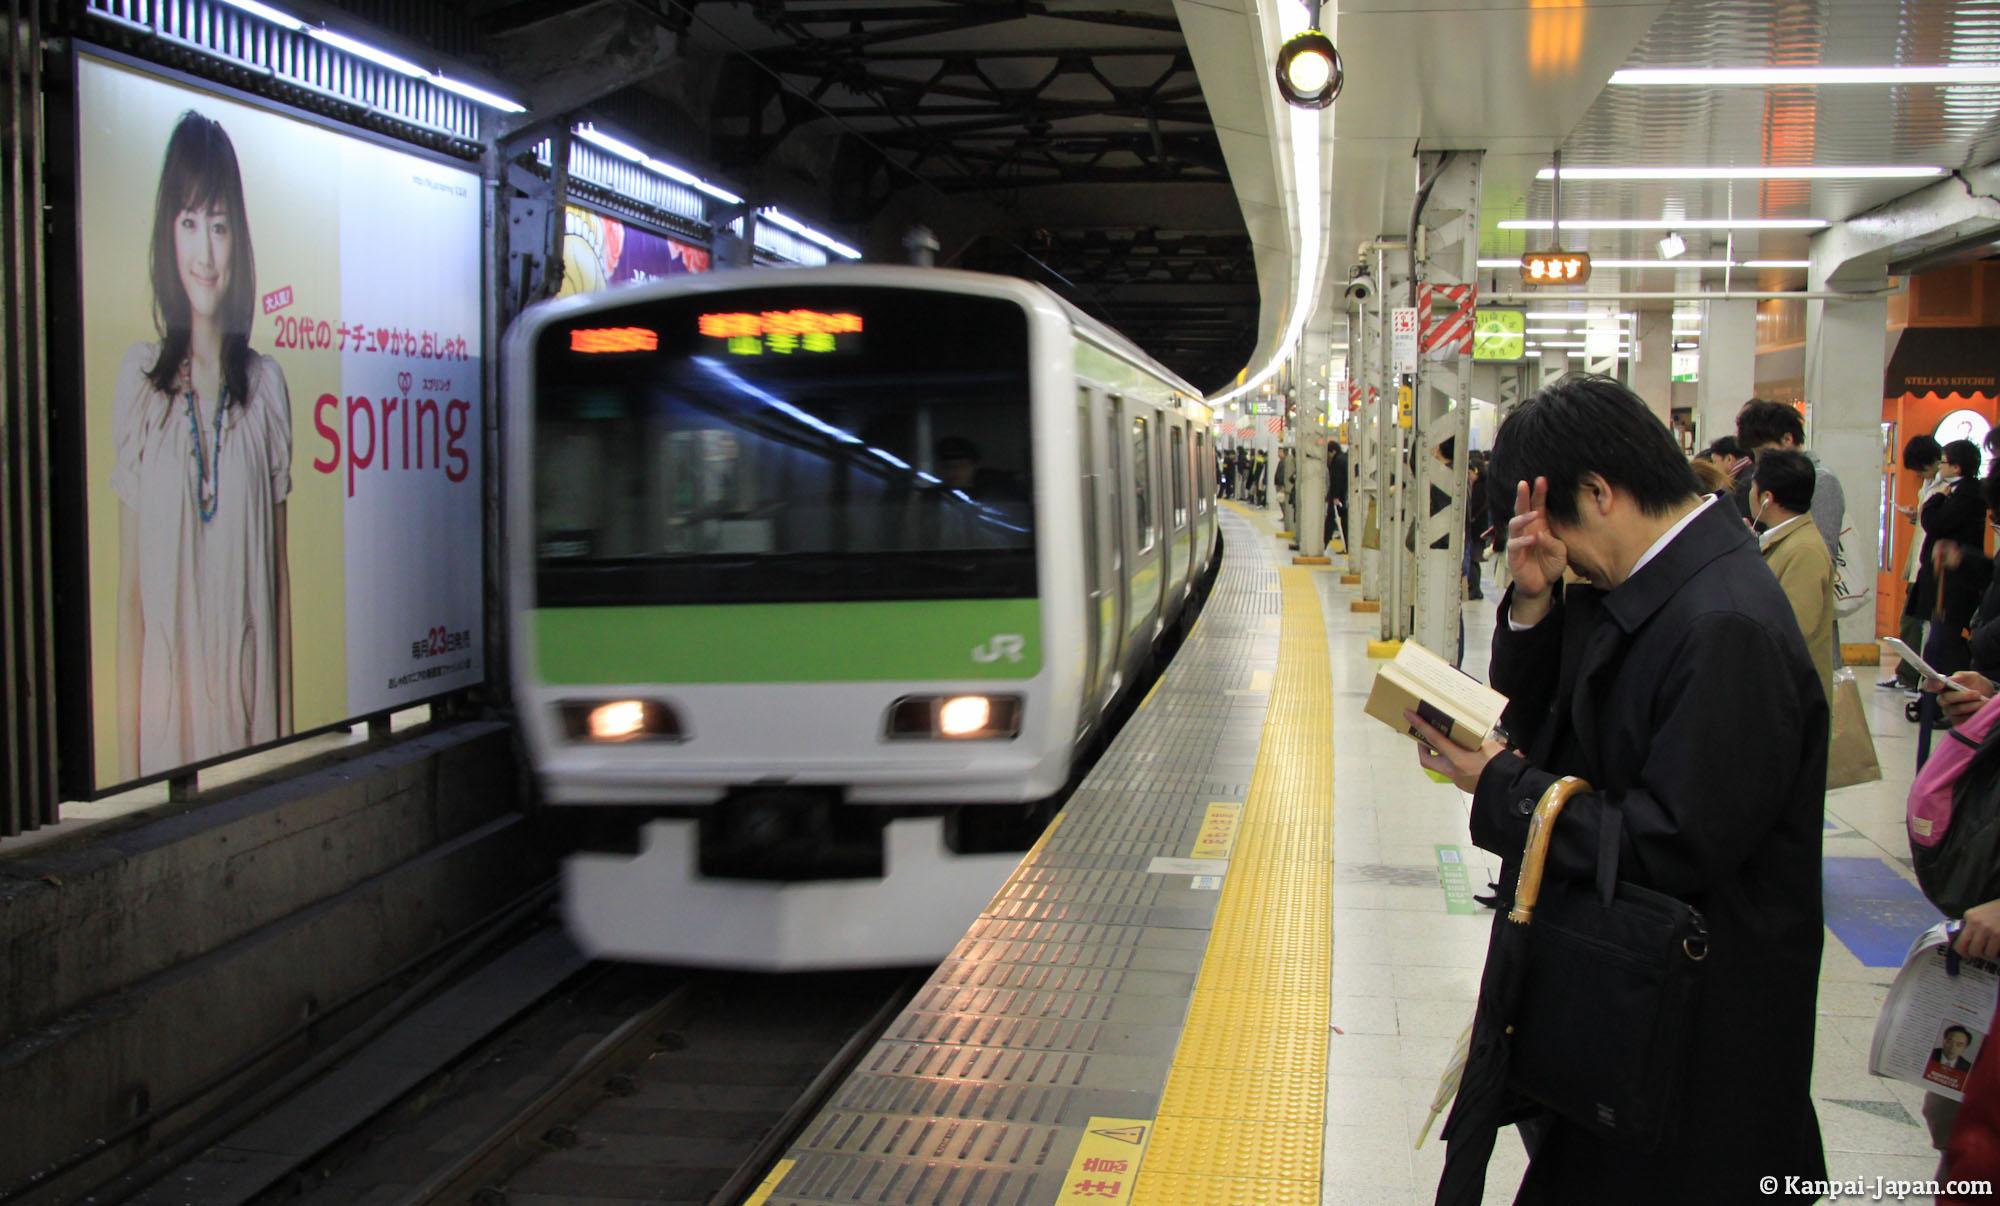 japan by train travel guide pdf